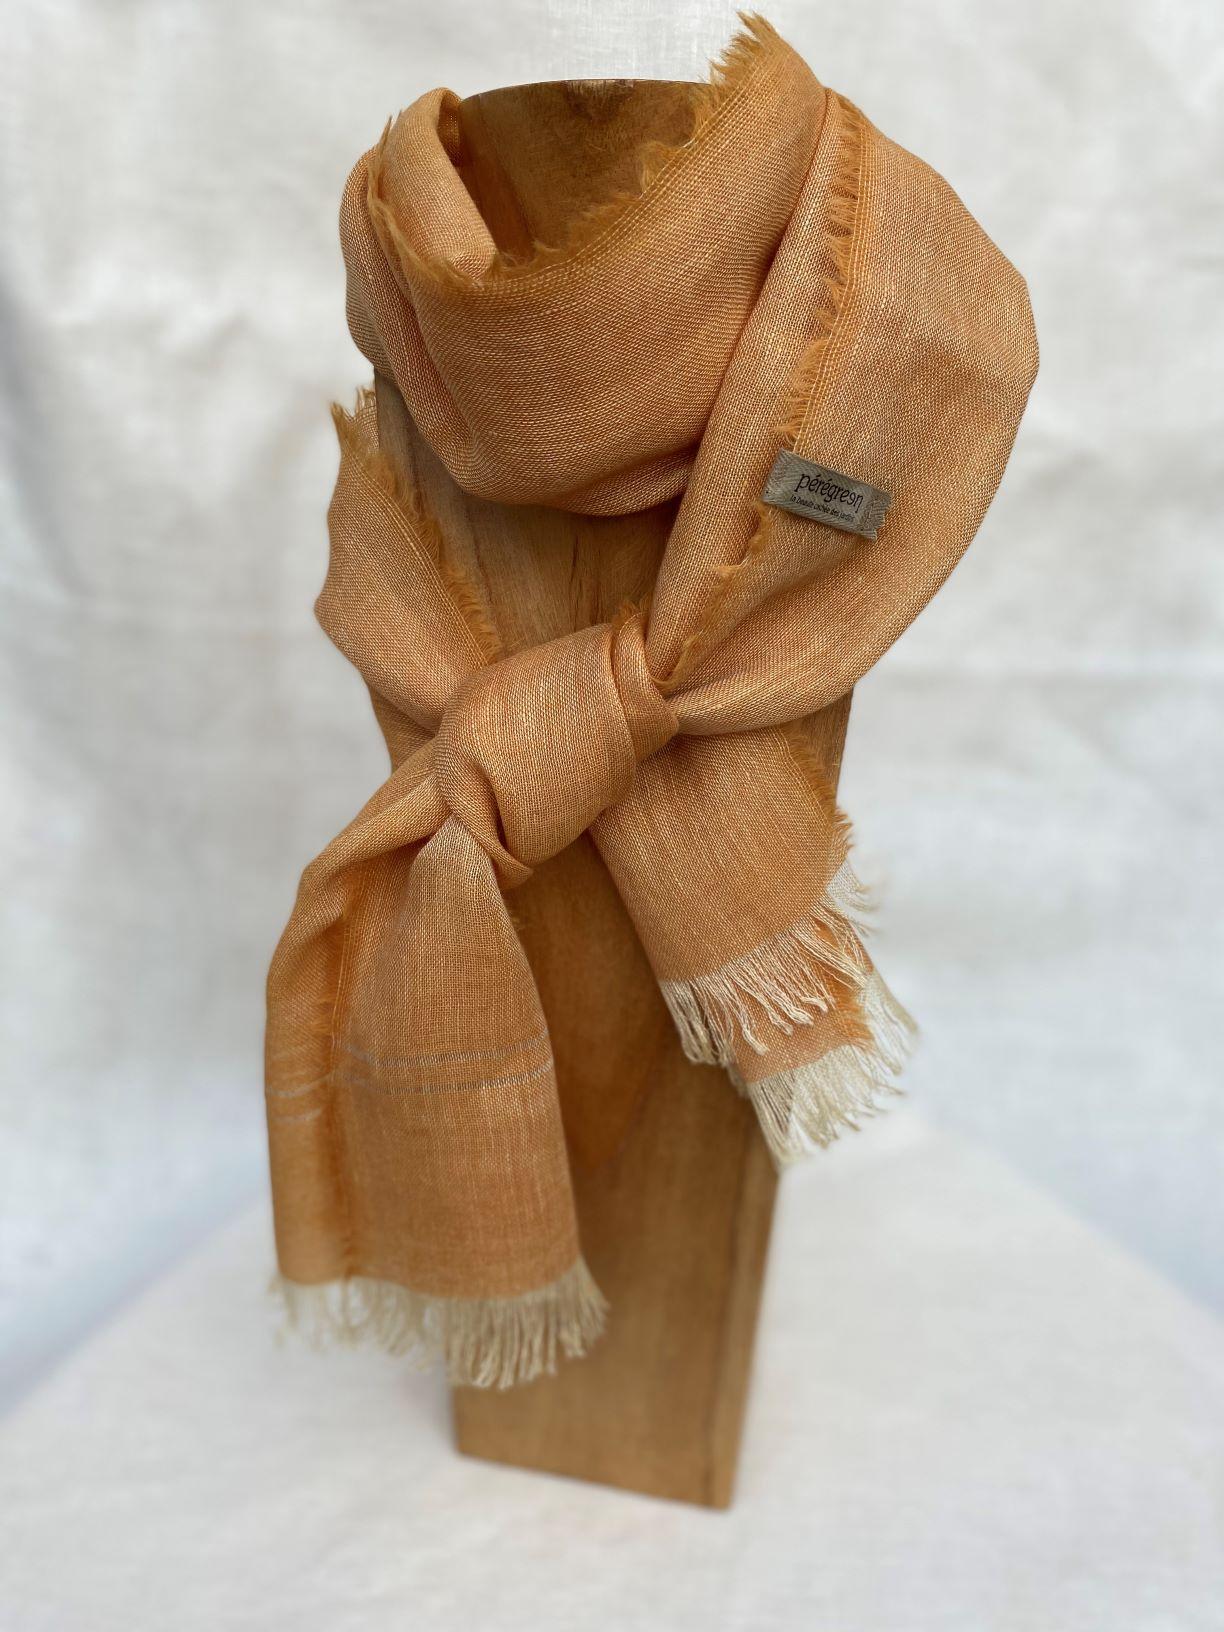 petit foulard orange lin alpaga peregreen